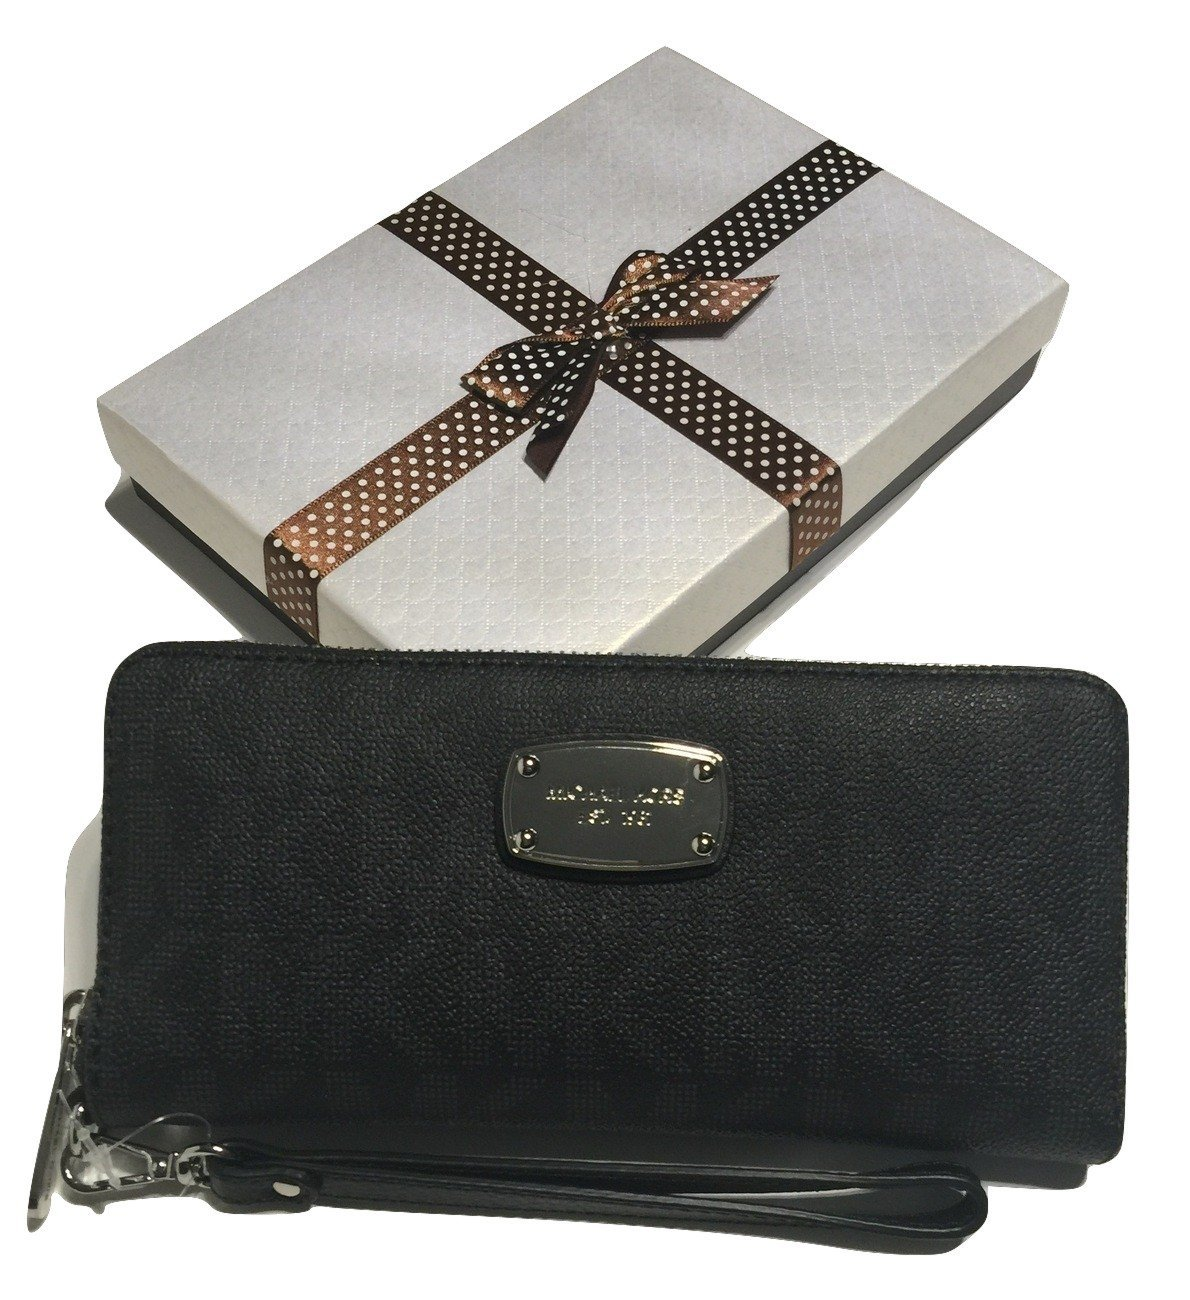 e018dd750e0b Michael Kors ZA Travel Continental Jet Set Clutch Wallet Wristlet with Gift  B... - $192.06